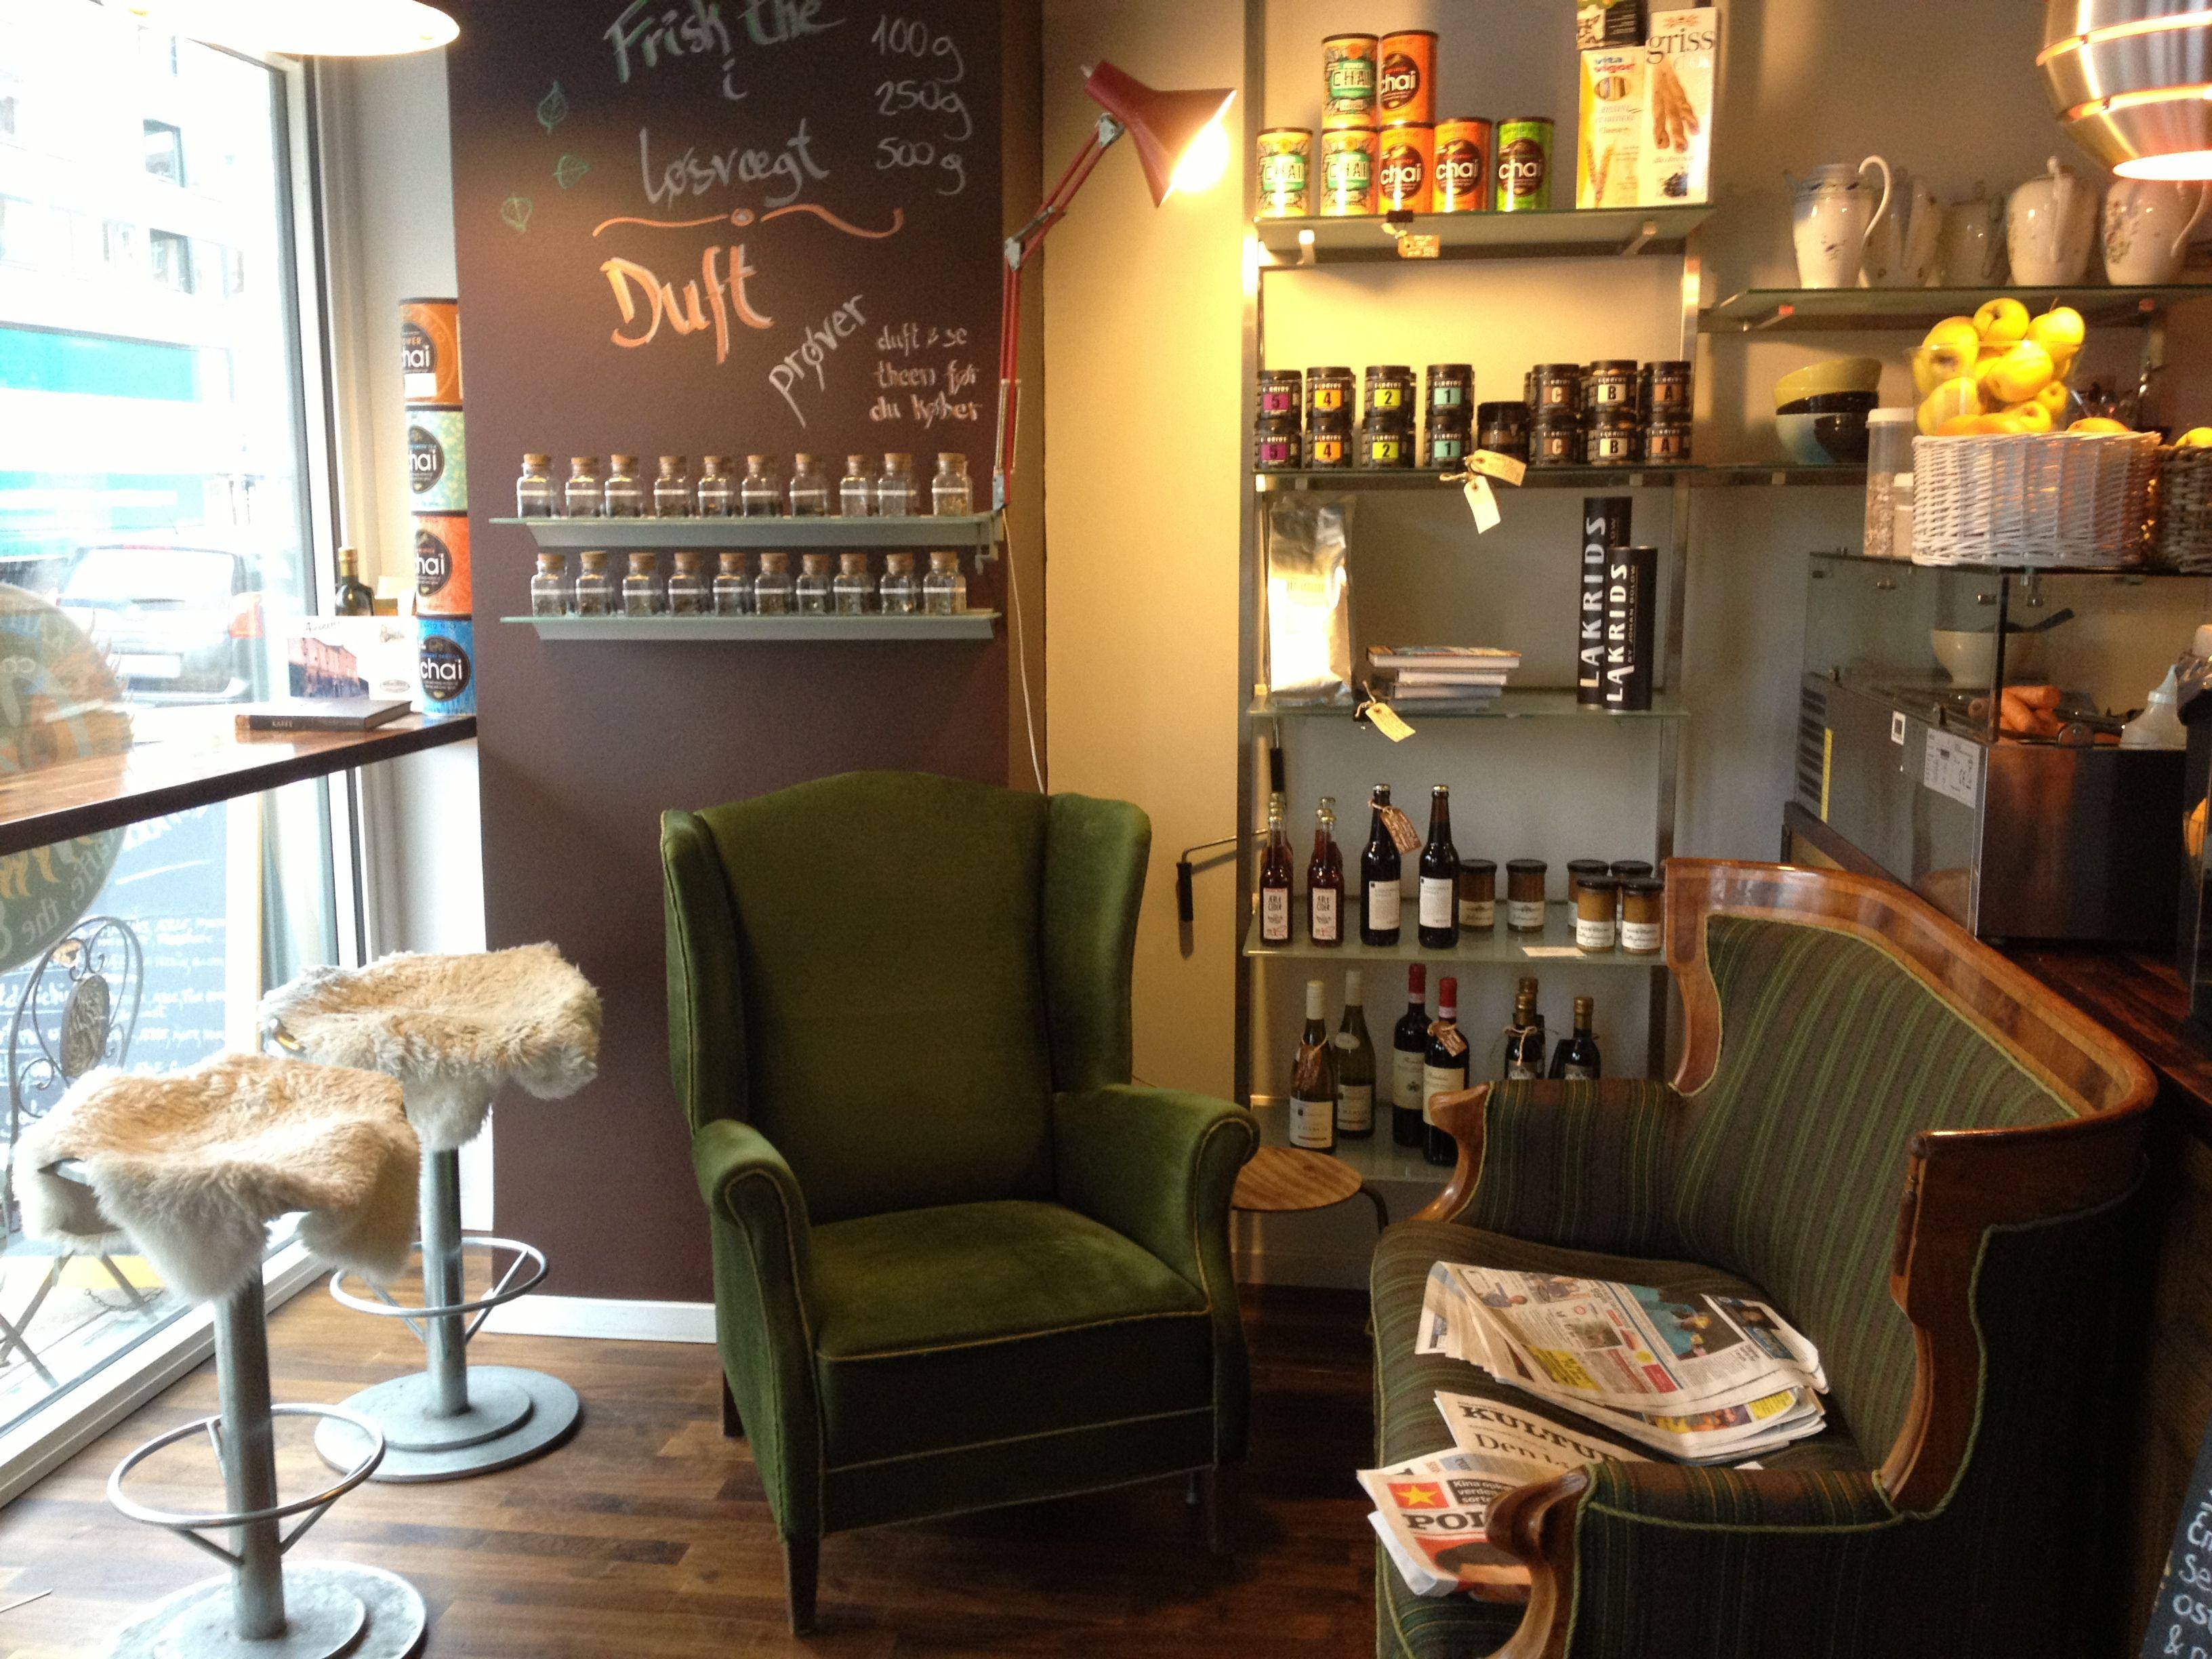 cozy cafe in copenhagen | decor | pinterest | cozy cafe